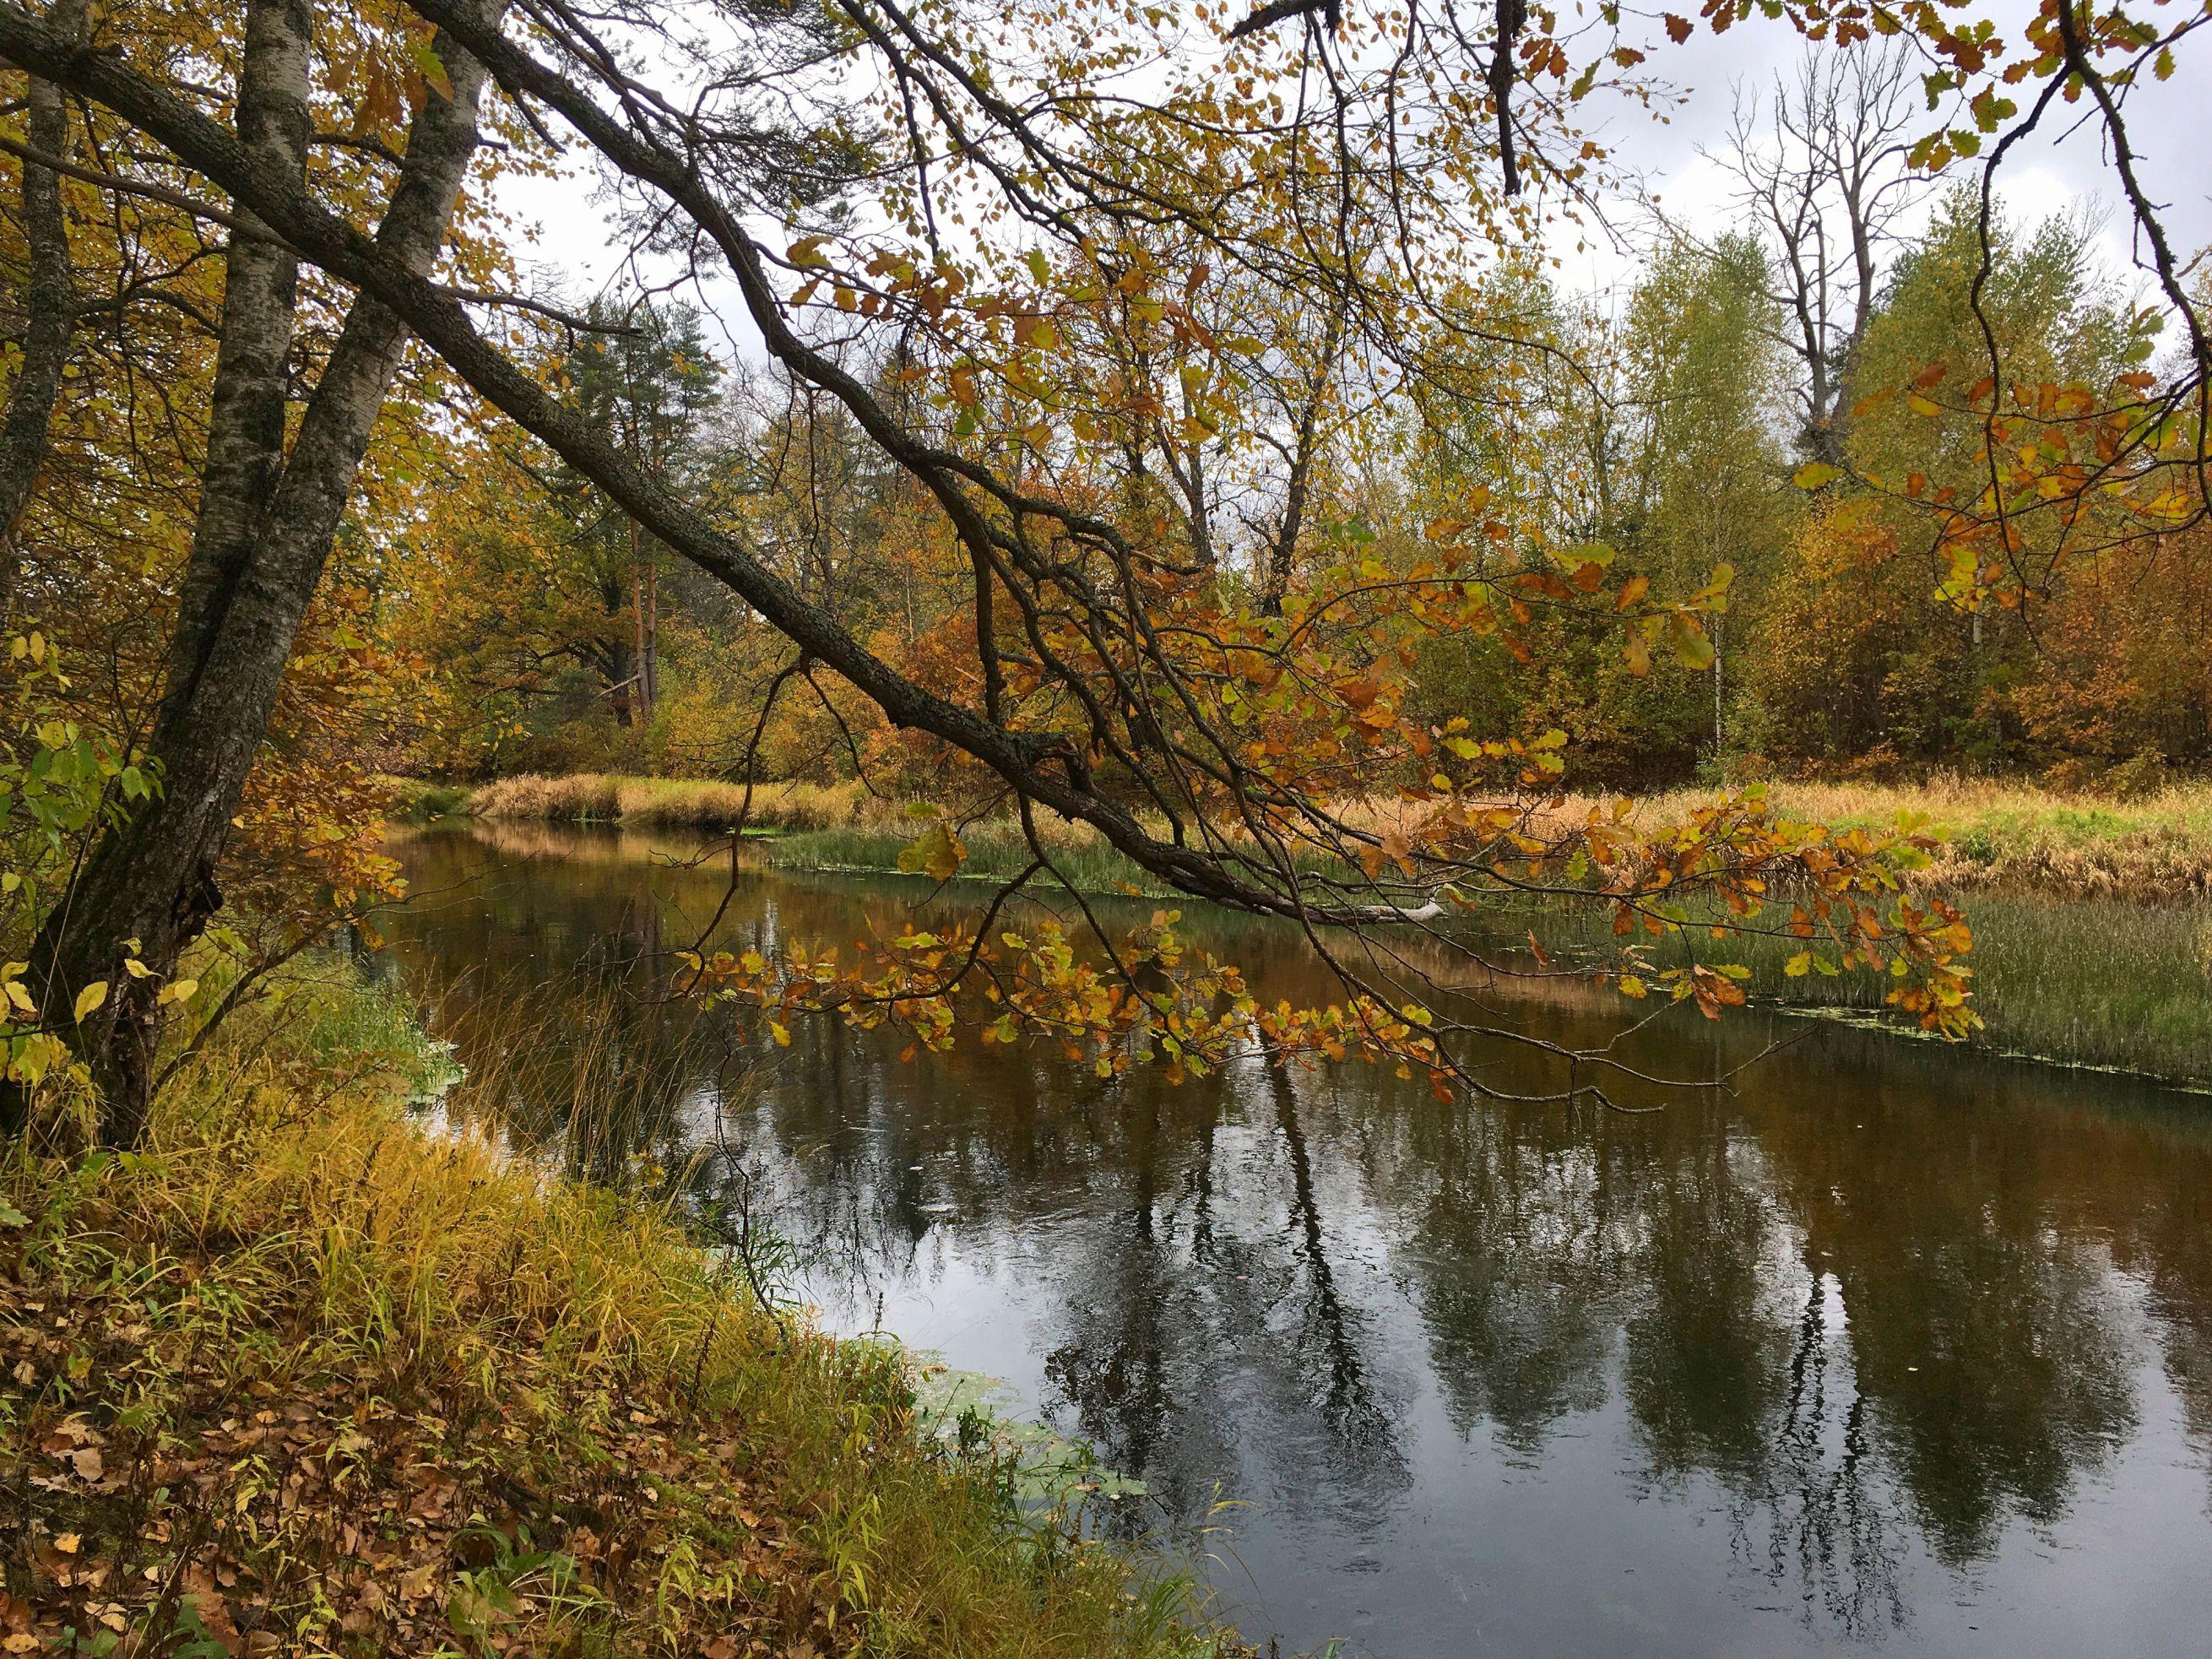 kerzhenets-reka